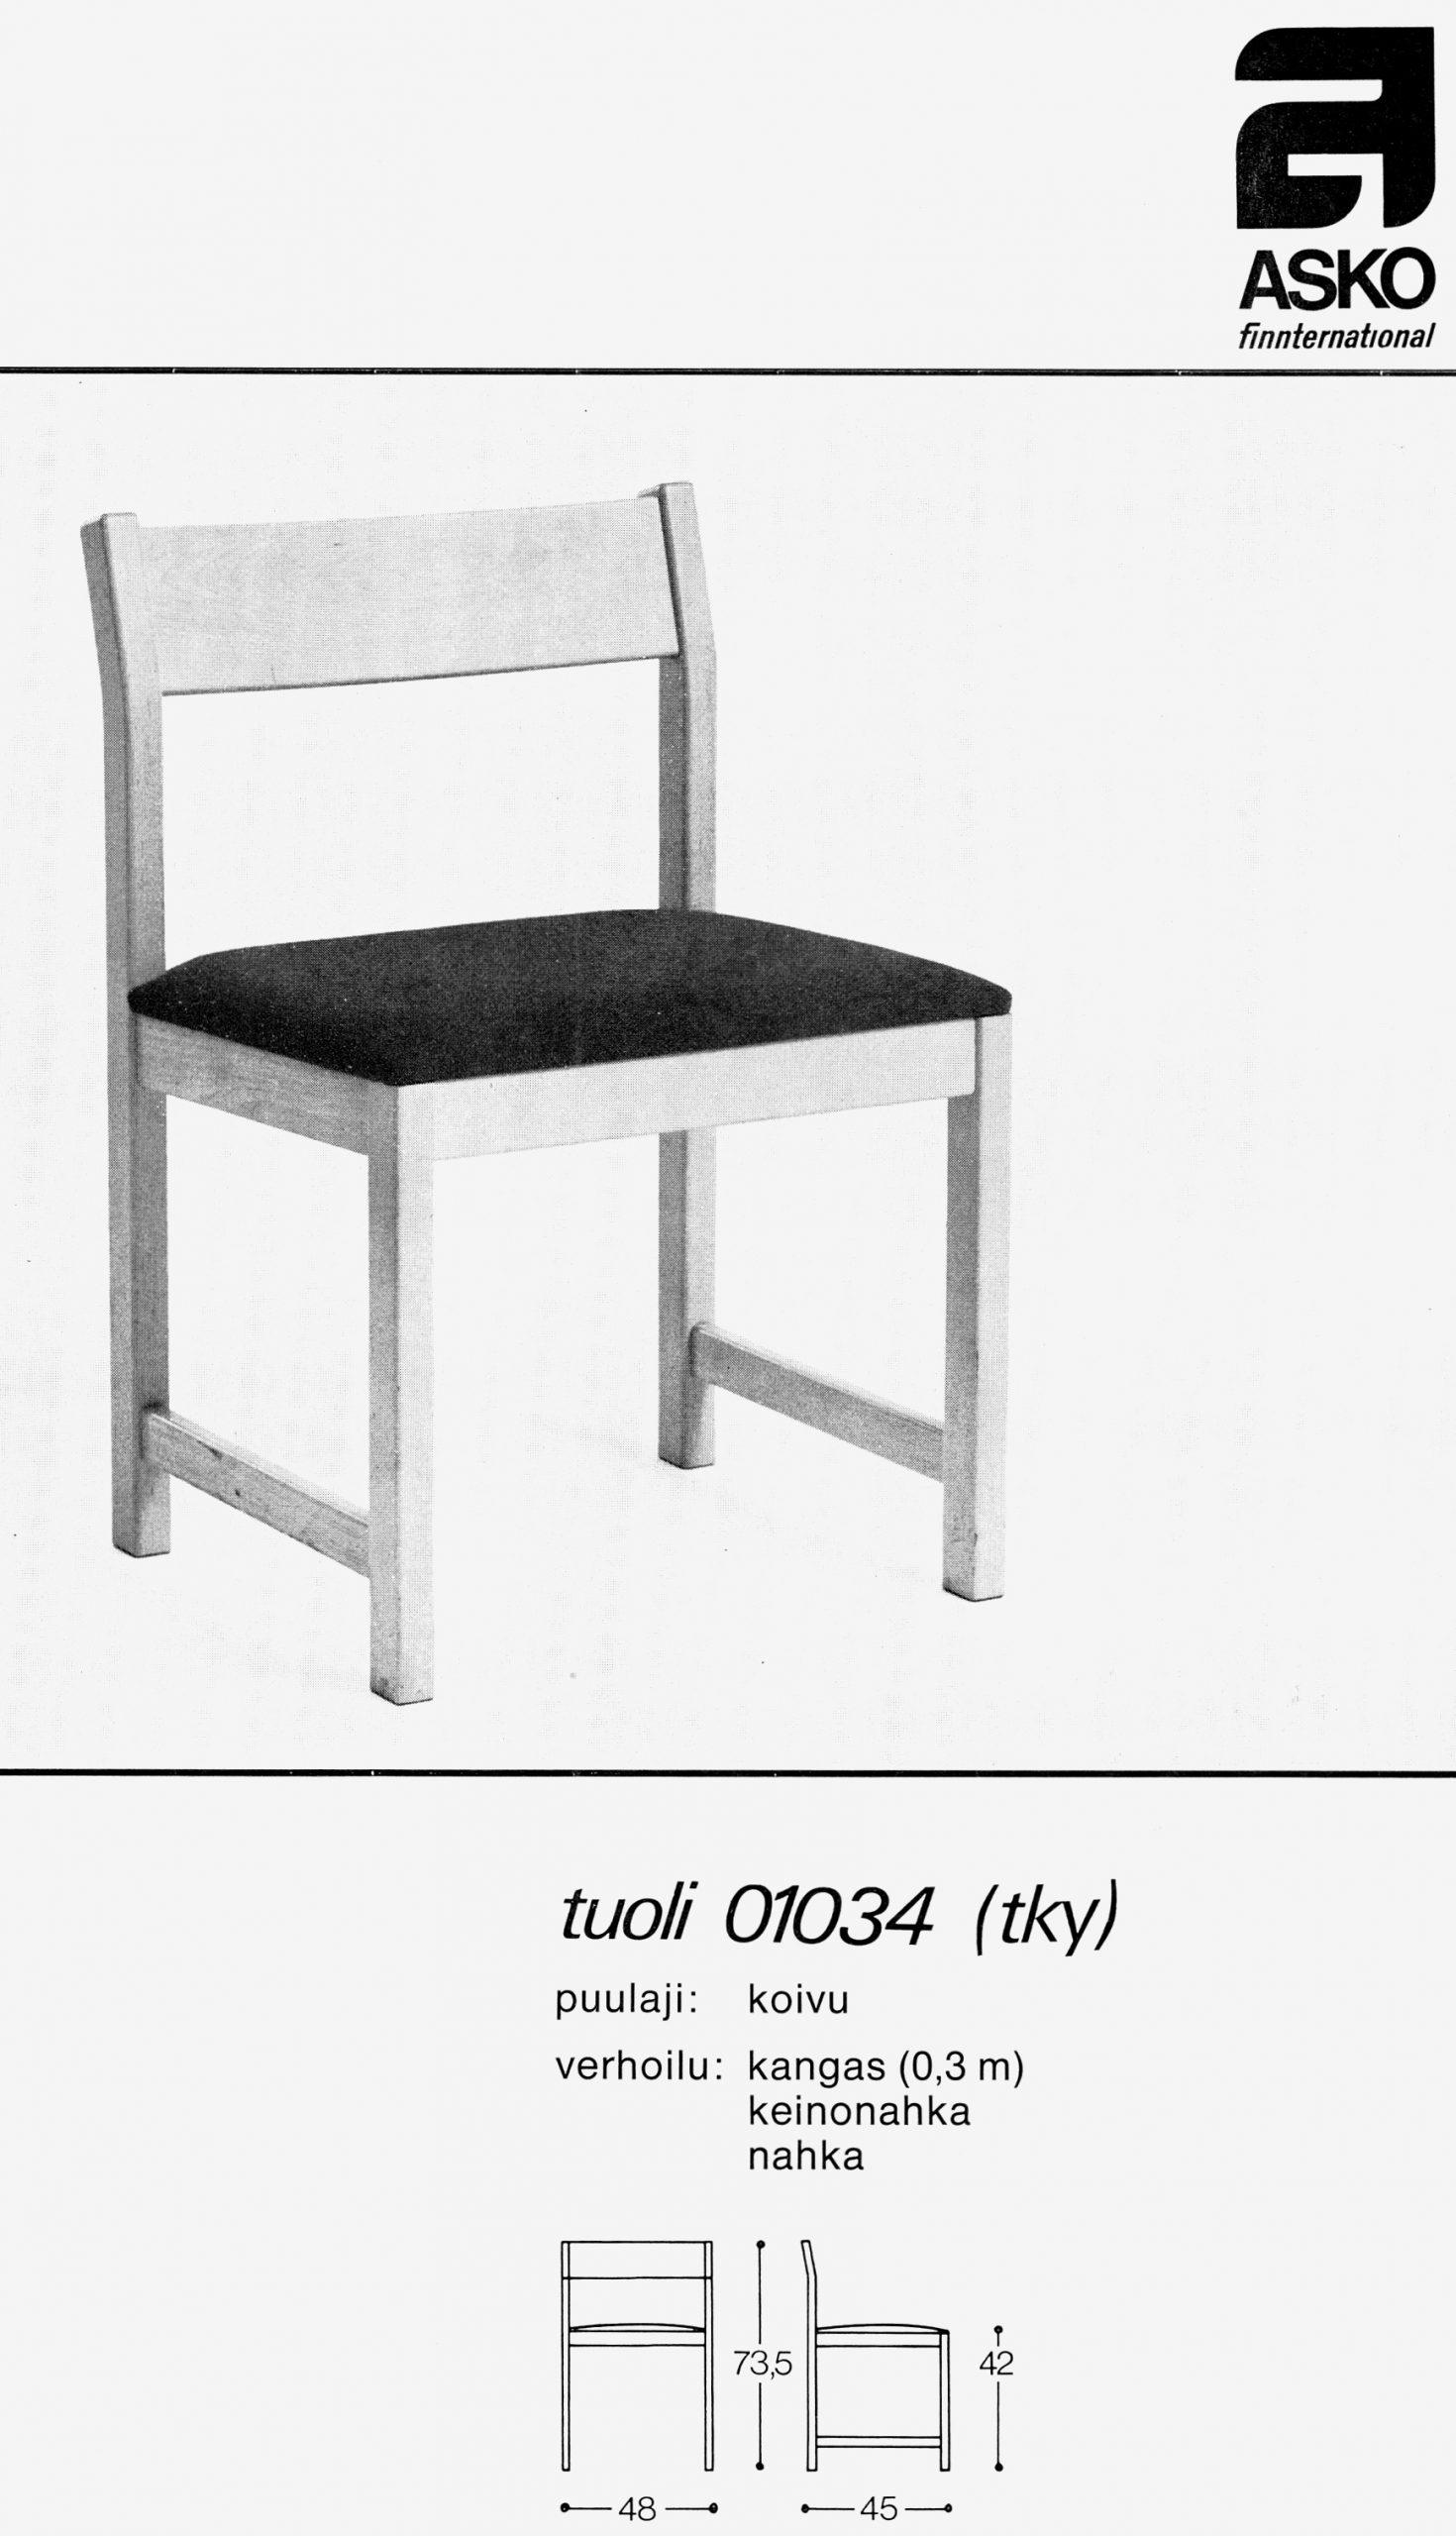 Tuoli nro 01034.